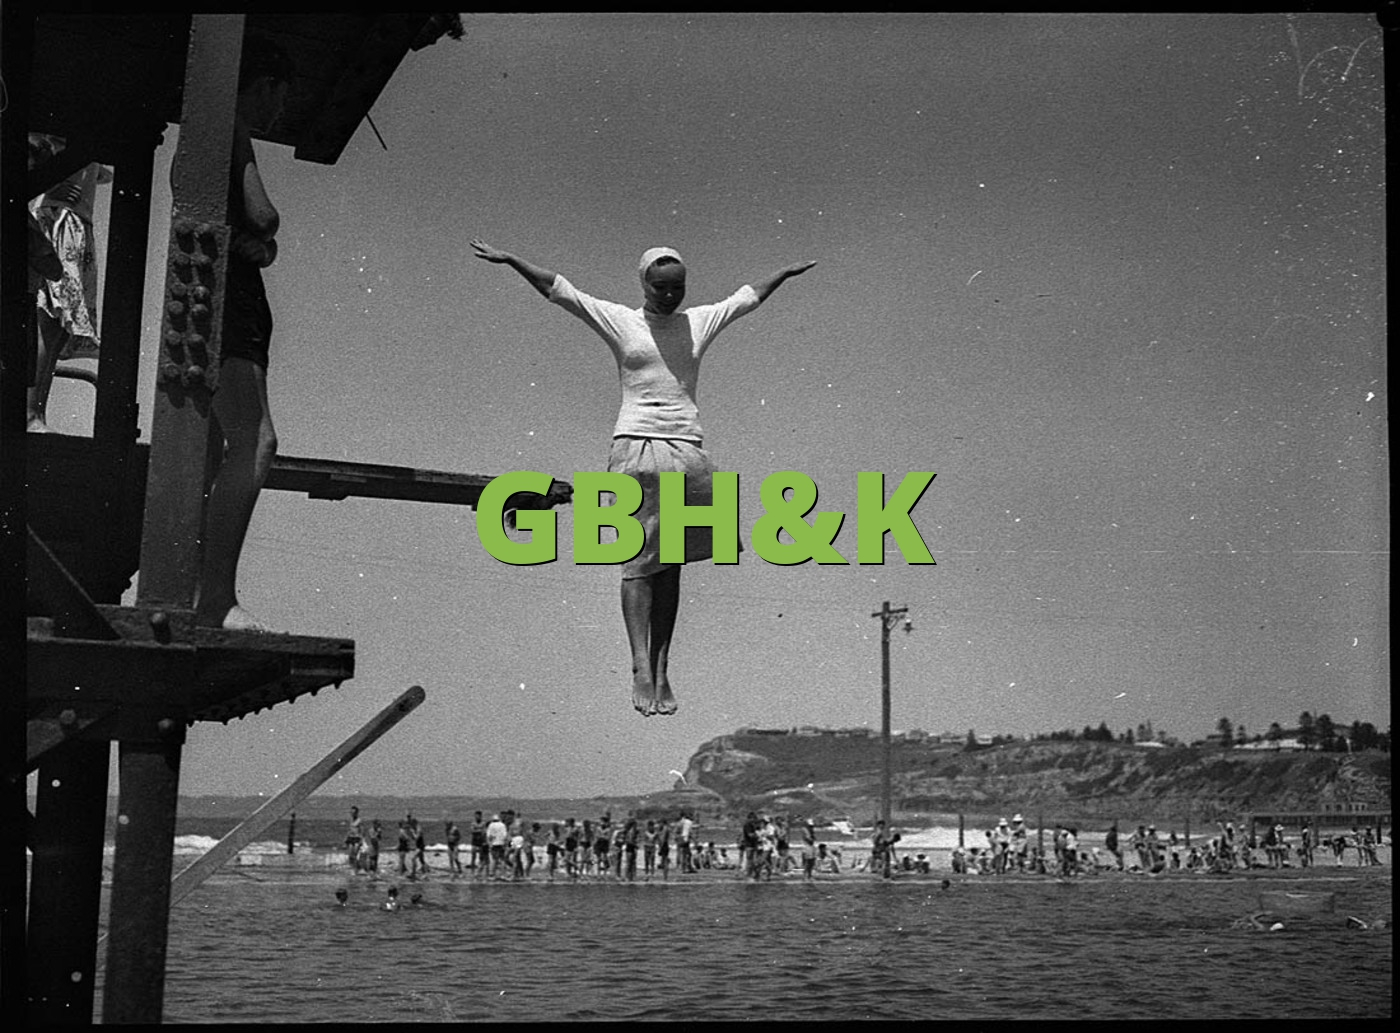 GBH&K